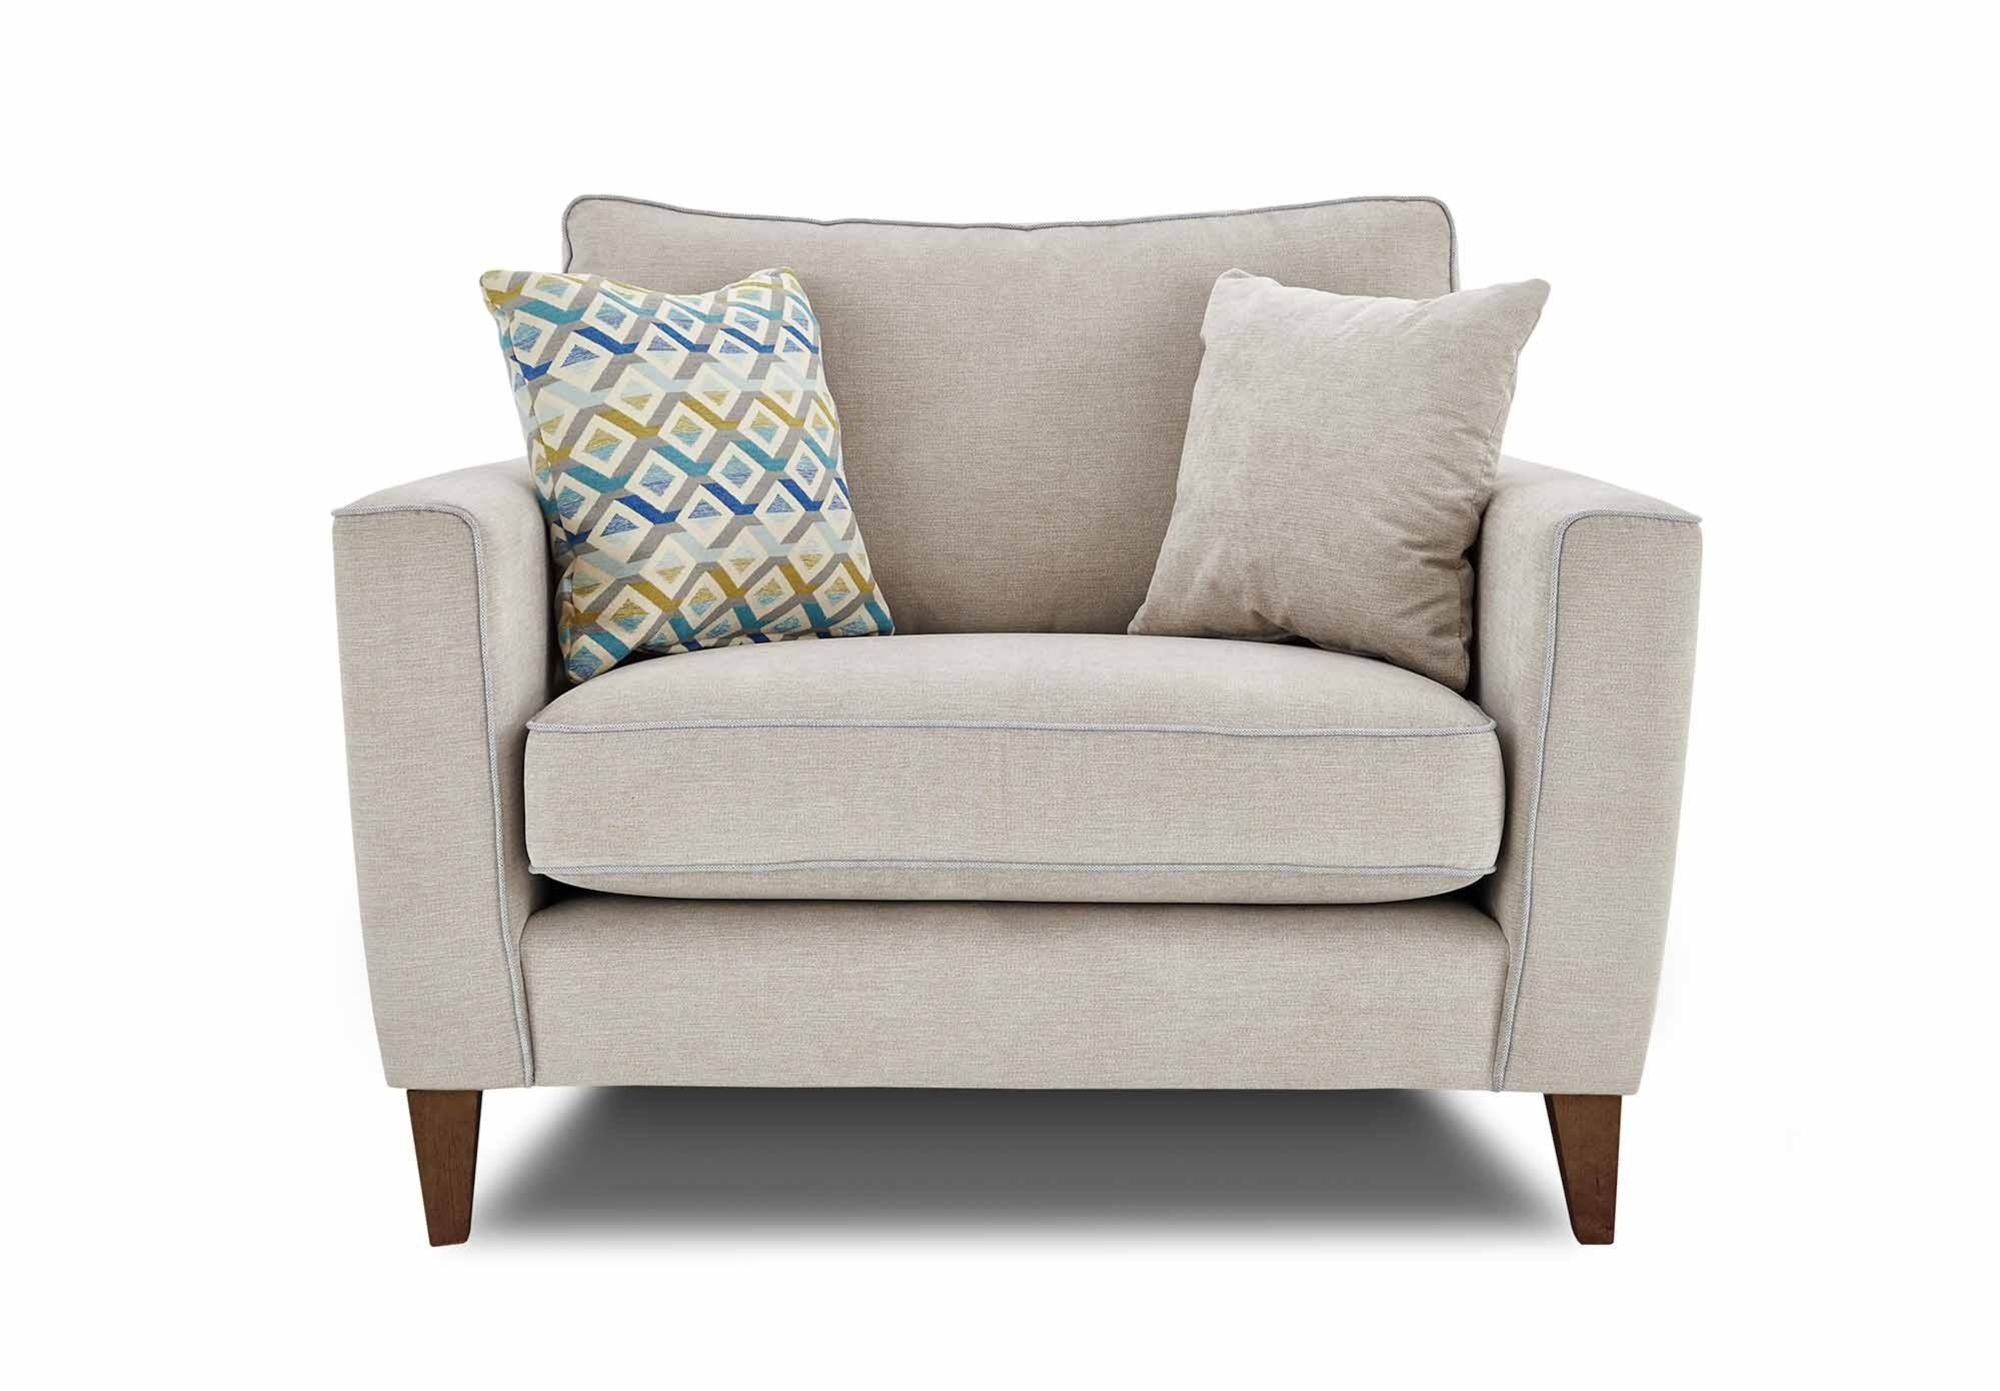 harlow cuddle chair grey bathroom safety shower tub bench 15 inspirations snuggle sofas sofa ideas